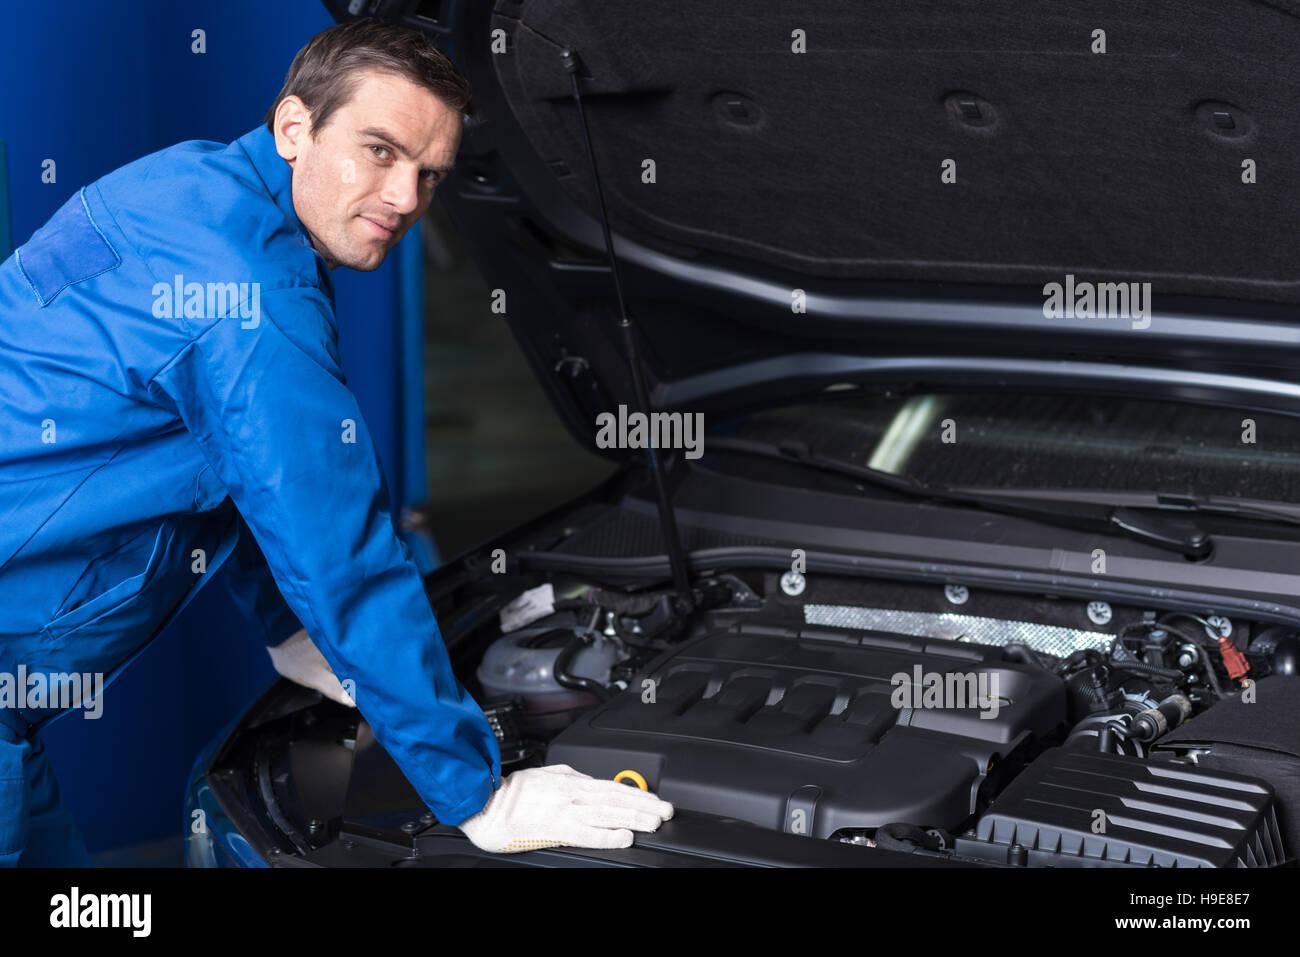 Professional confident mechanic chacking car engine - Stock Image